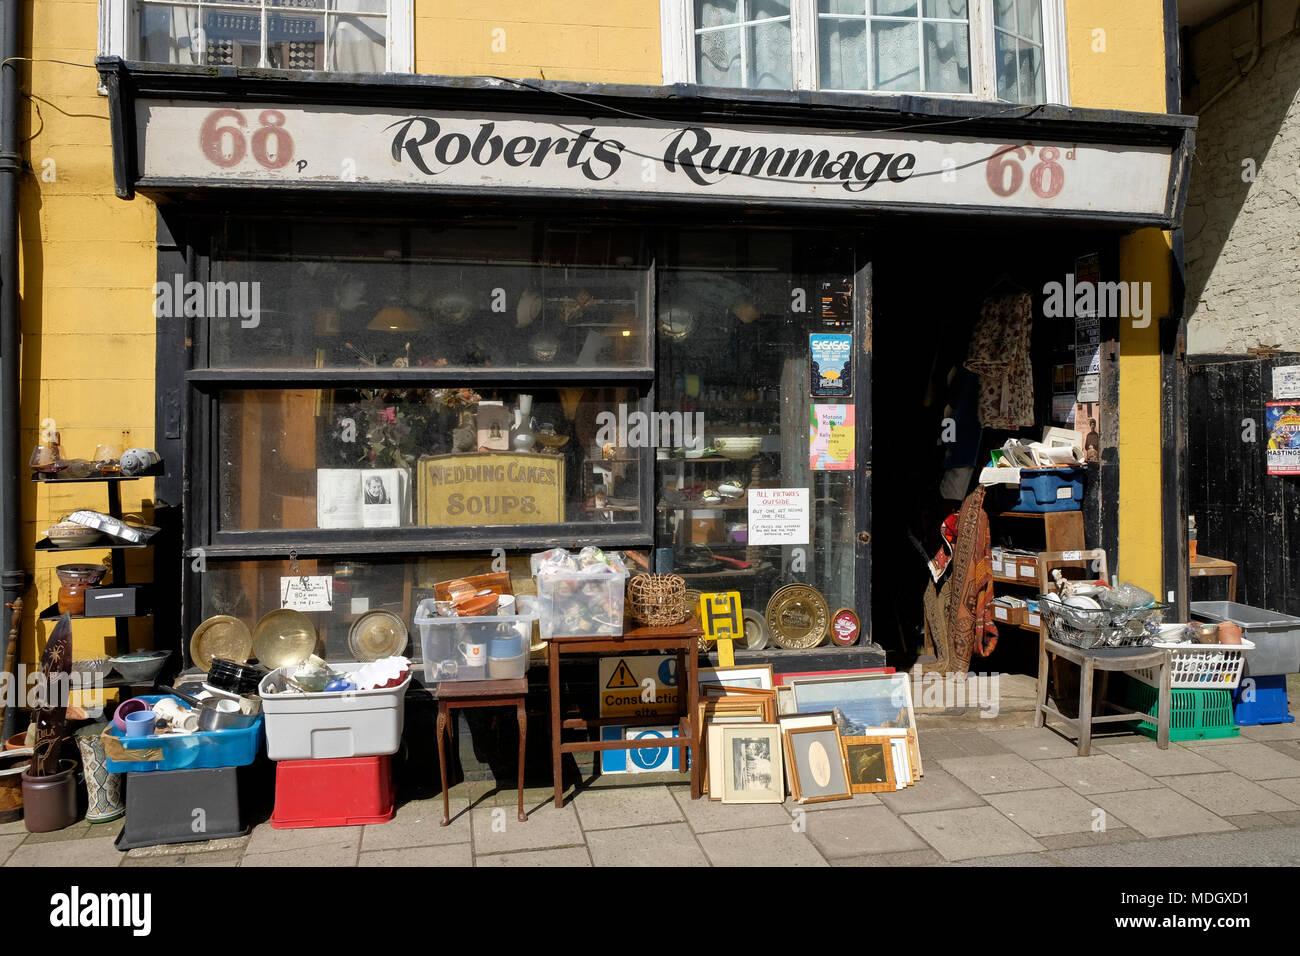 Roberts Rummage shop, Hastings, uk - Stock Image